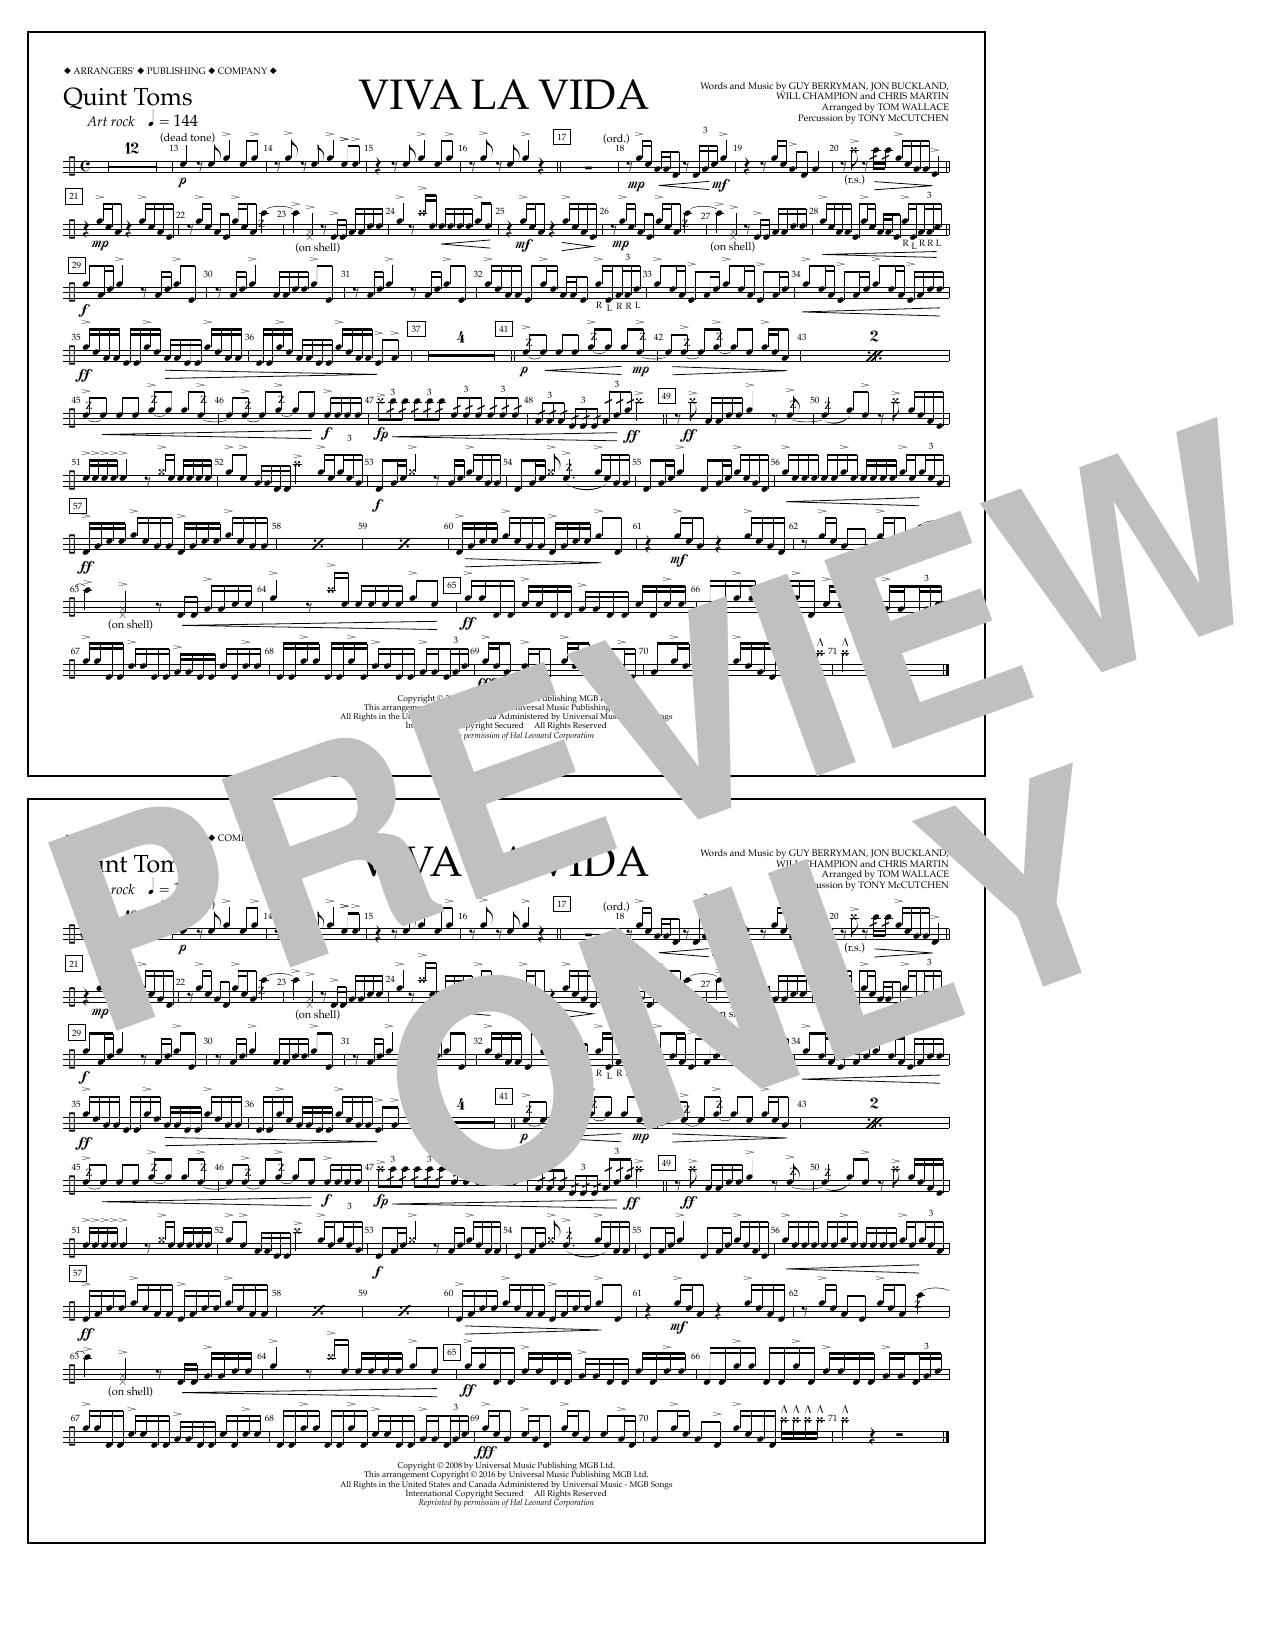 Tom Wallace Viva La Vida - Quint-Toms sheet music notes and chords. Download Printable PDF.